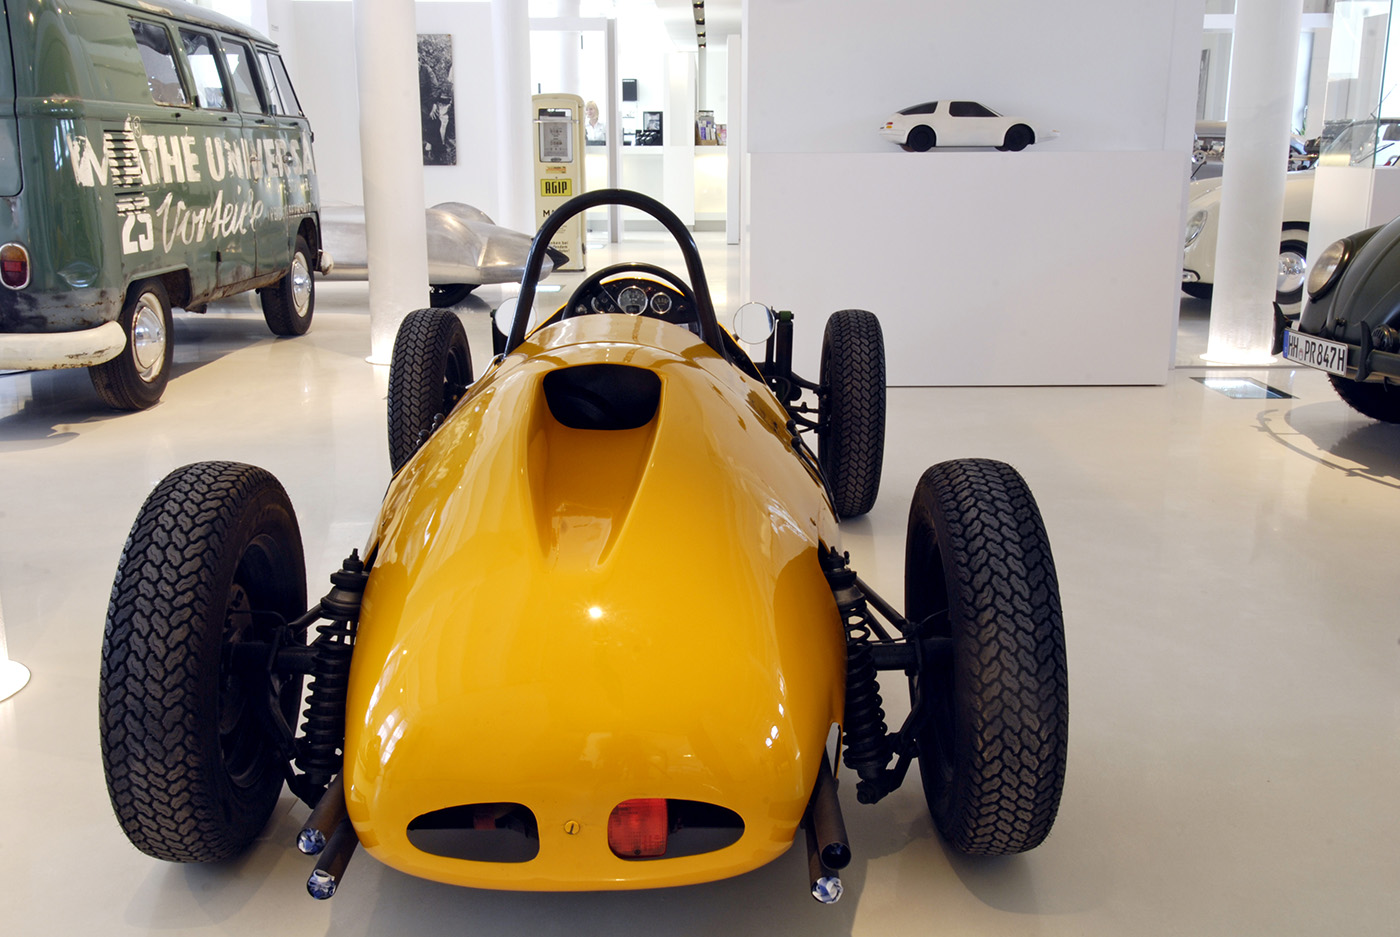 Formel-Rennwagen, VW-Bus Bulli, Prototyp-Museum, Hafencity